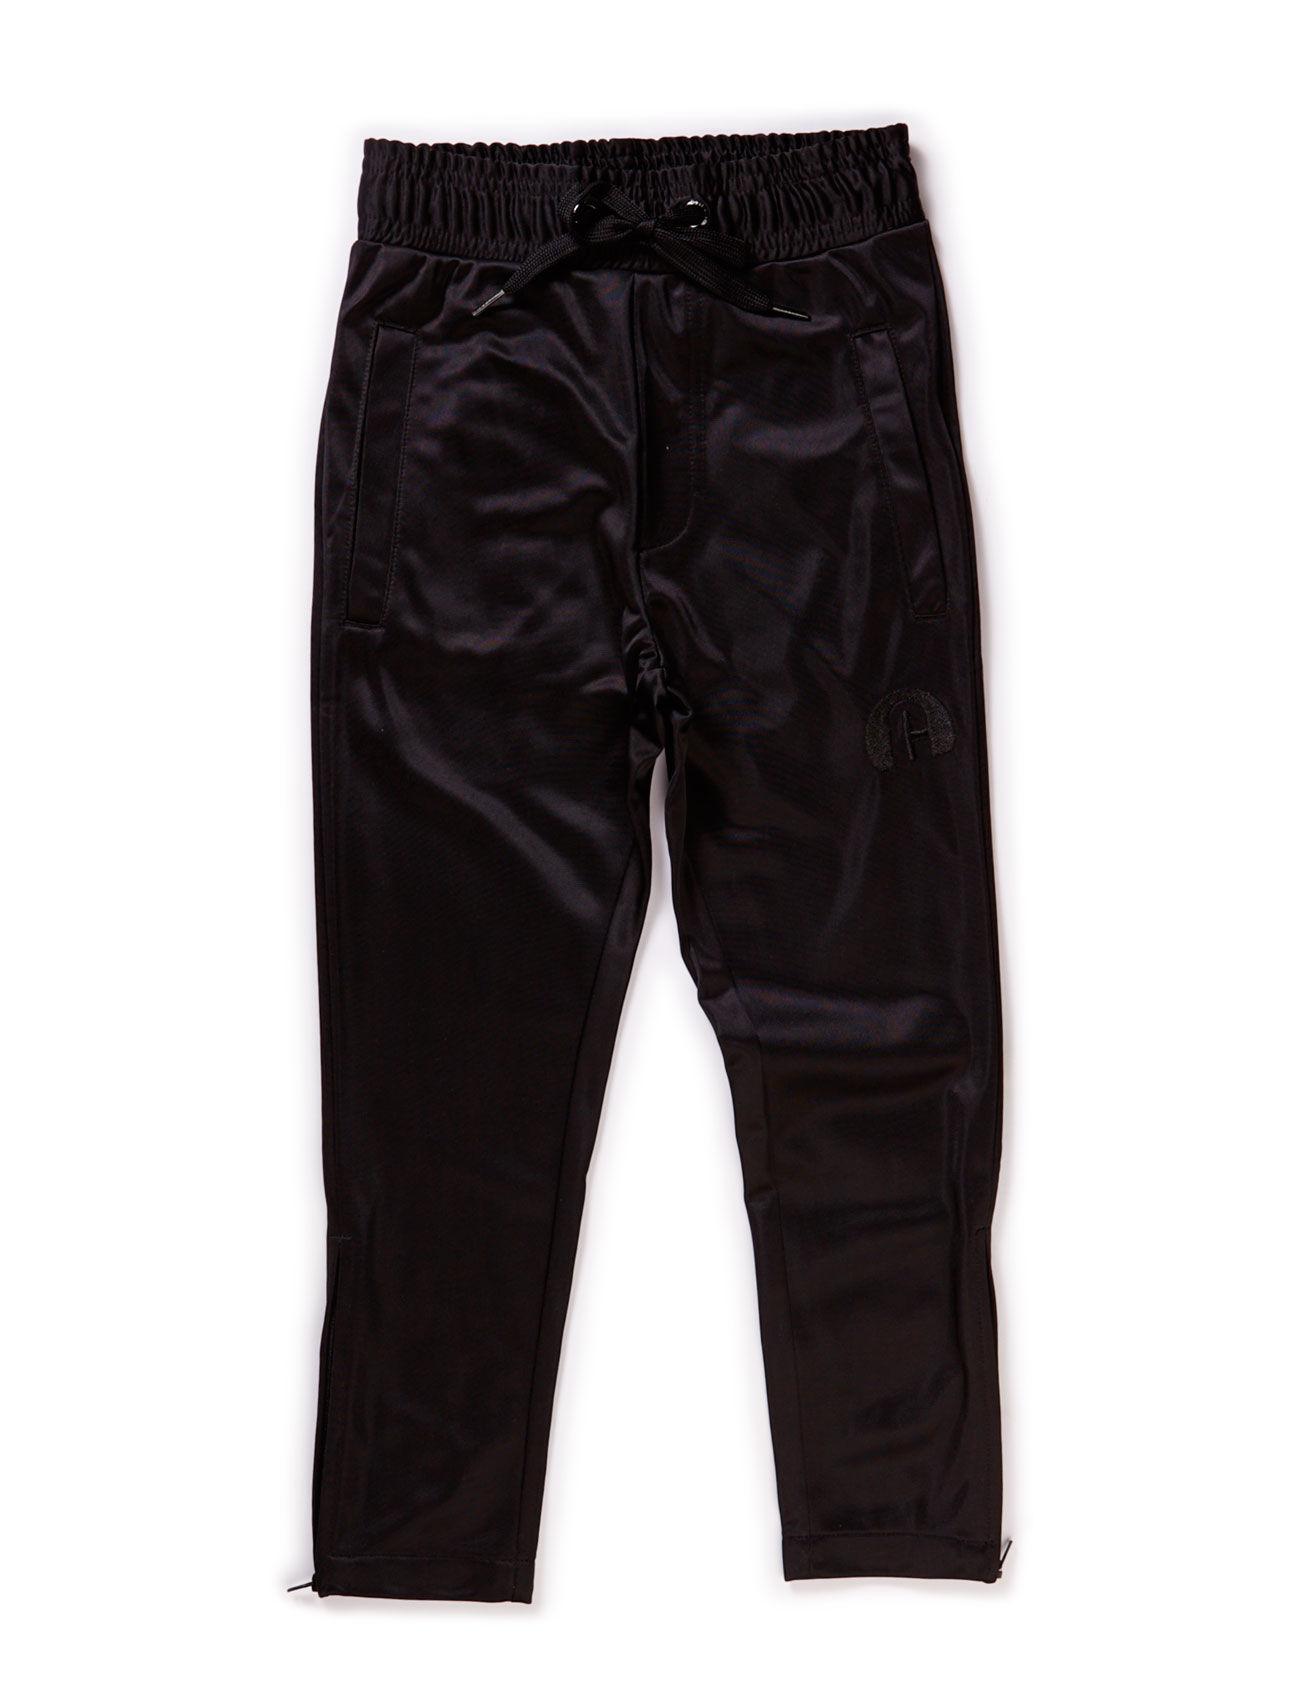 Fraser Shorts